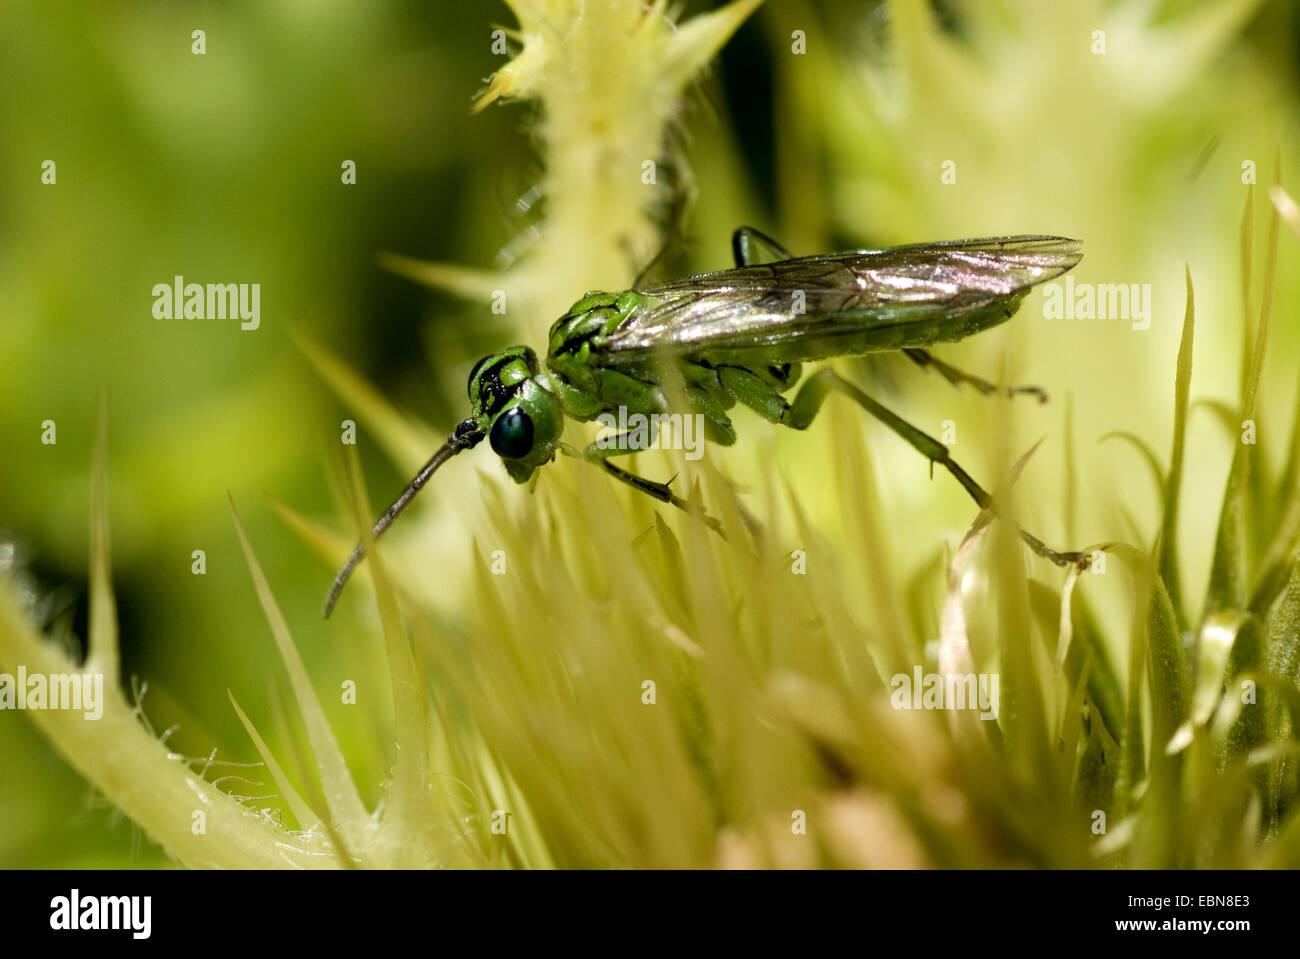 Sawfly (Tenthredo olivacea), on flower, Germany - Stock Image